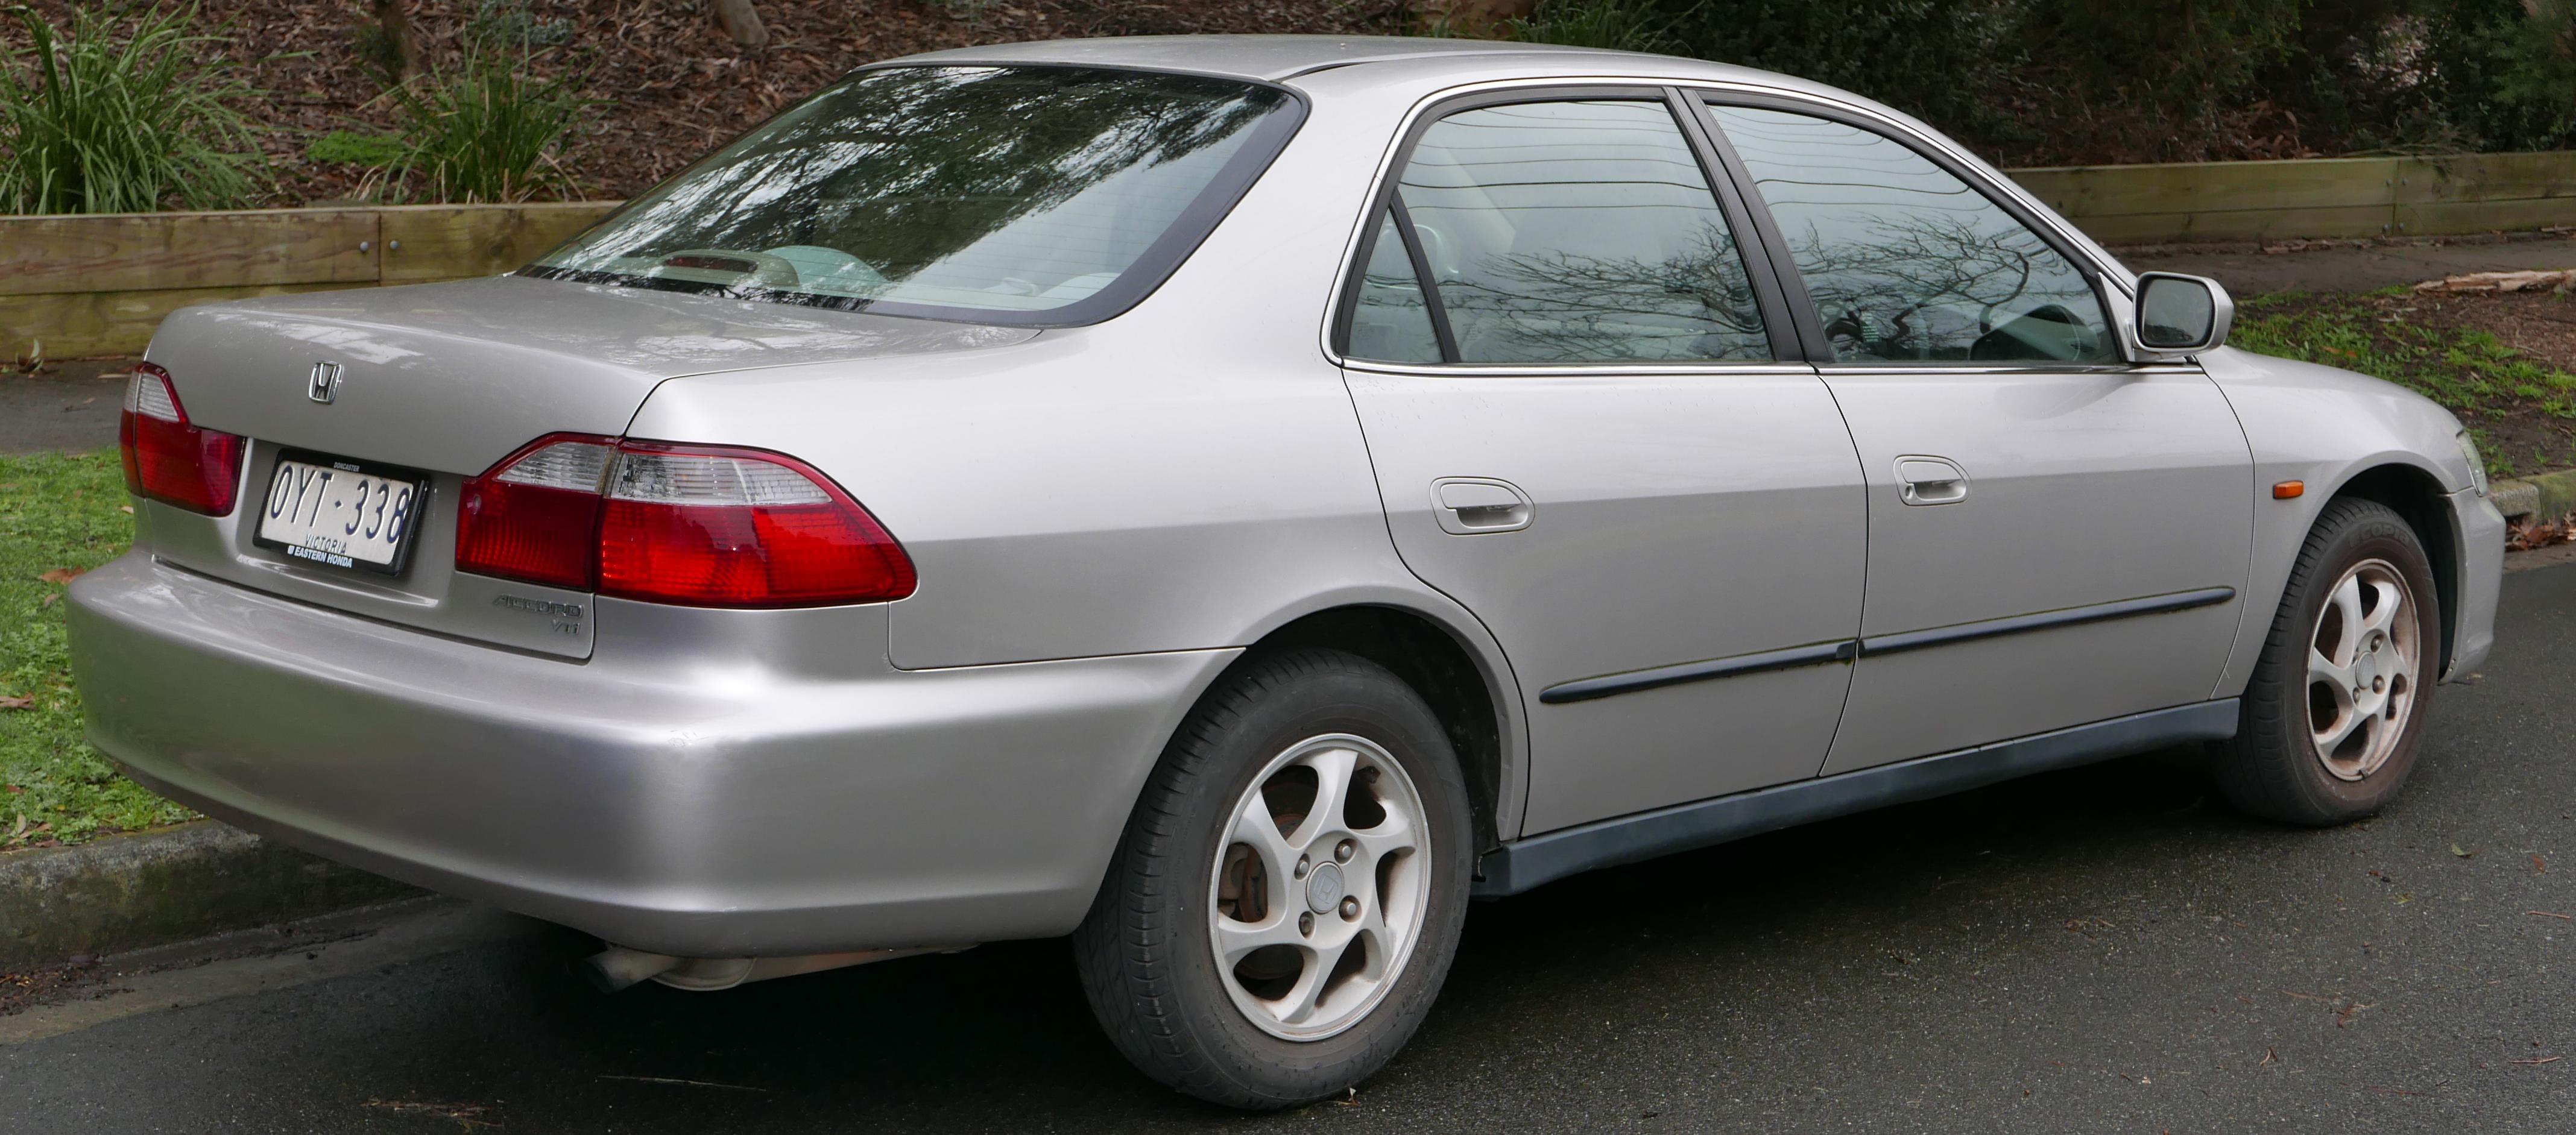 Ficheiro:1998 Honda Accord VTi Sedan (2015 08 07) 02 (